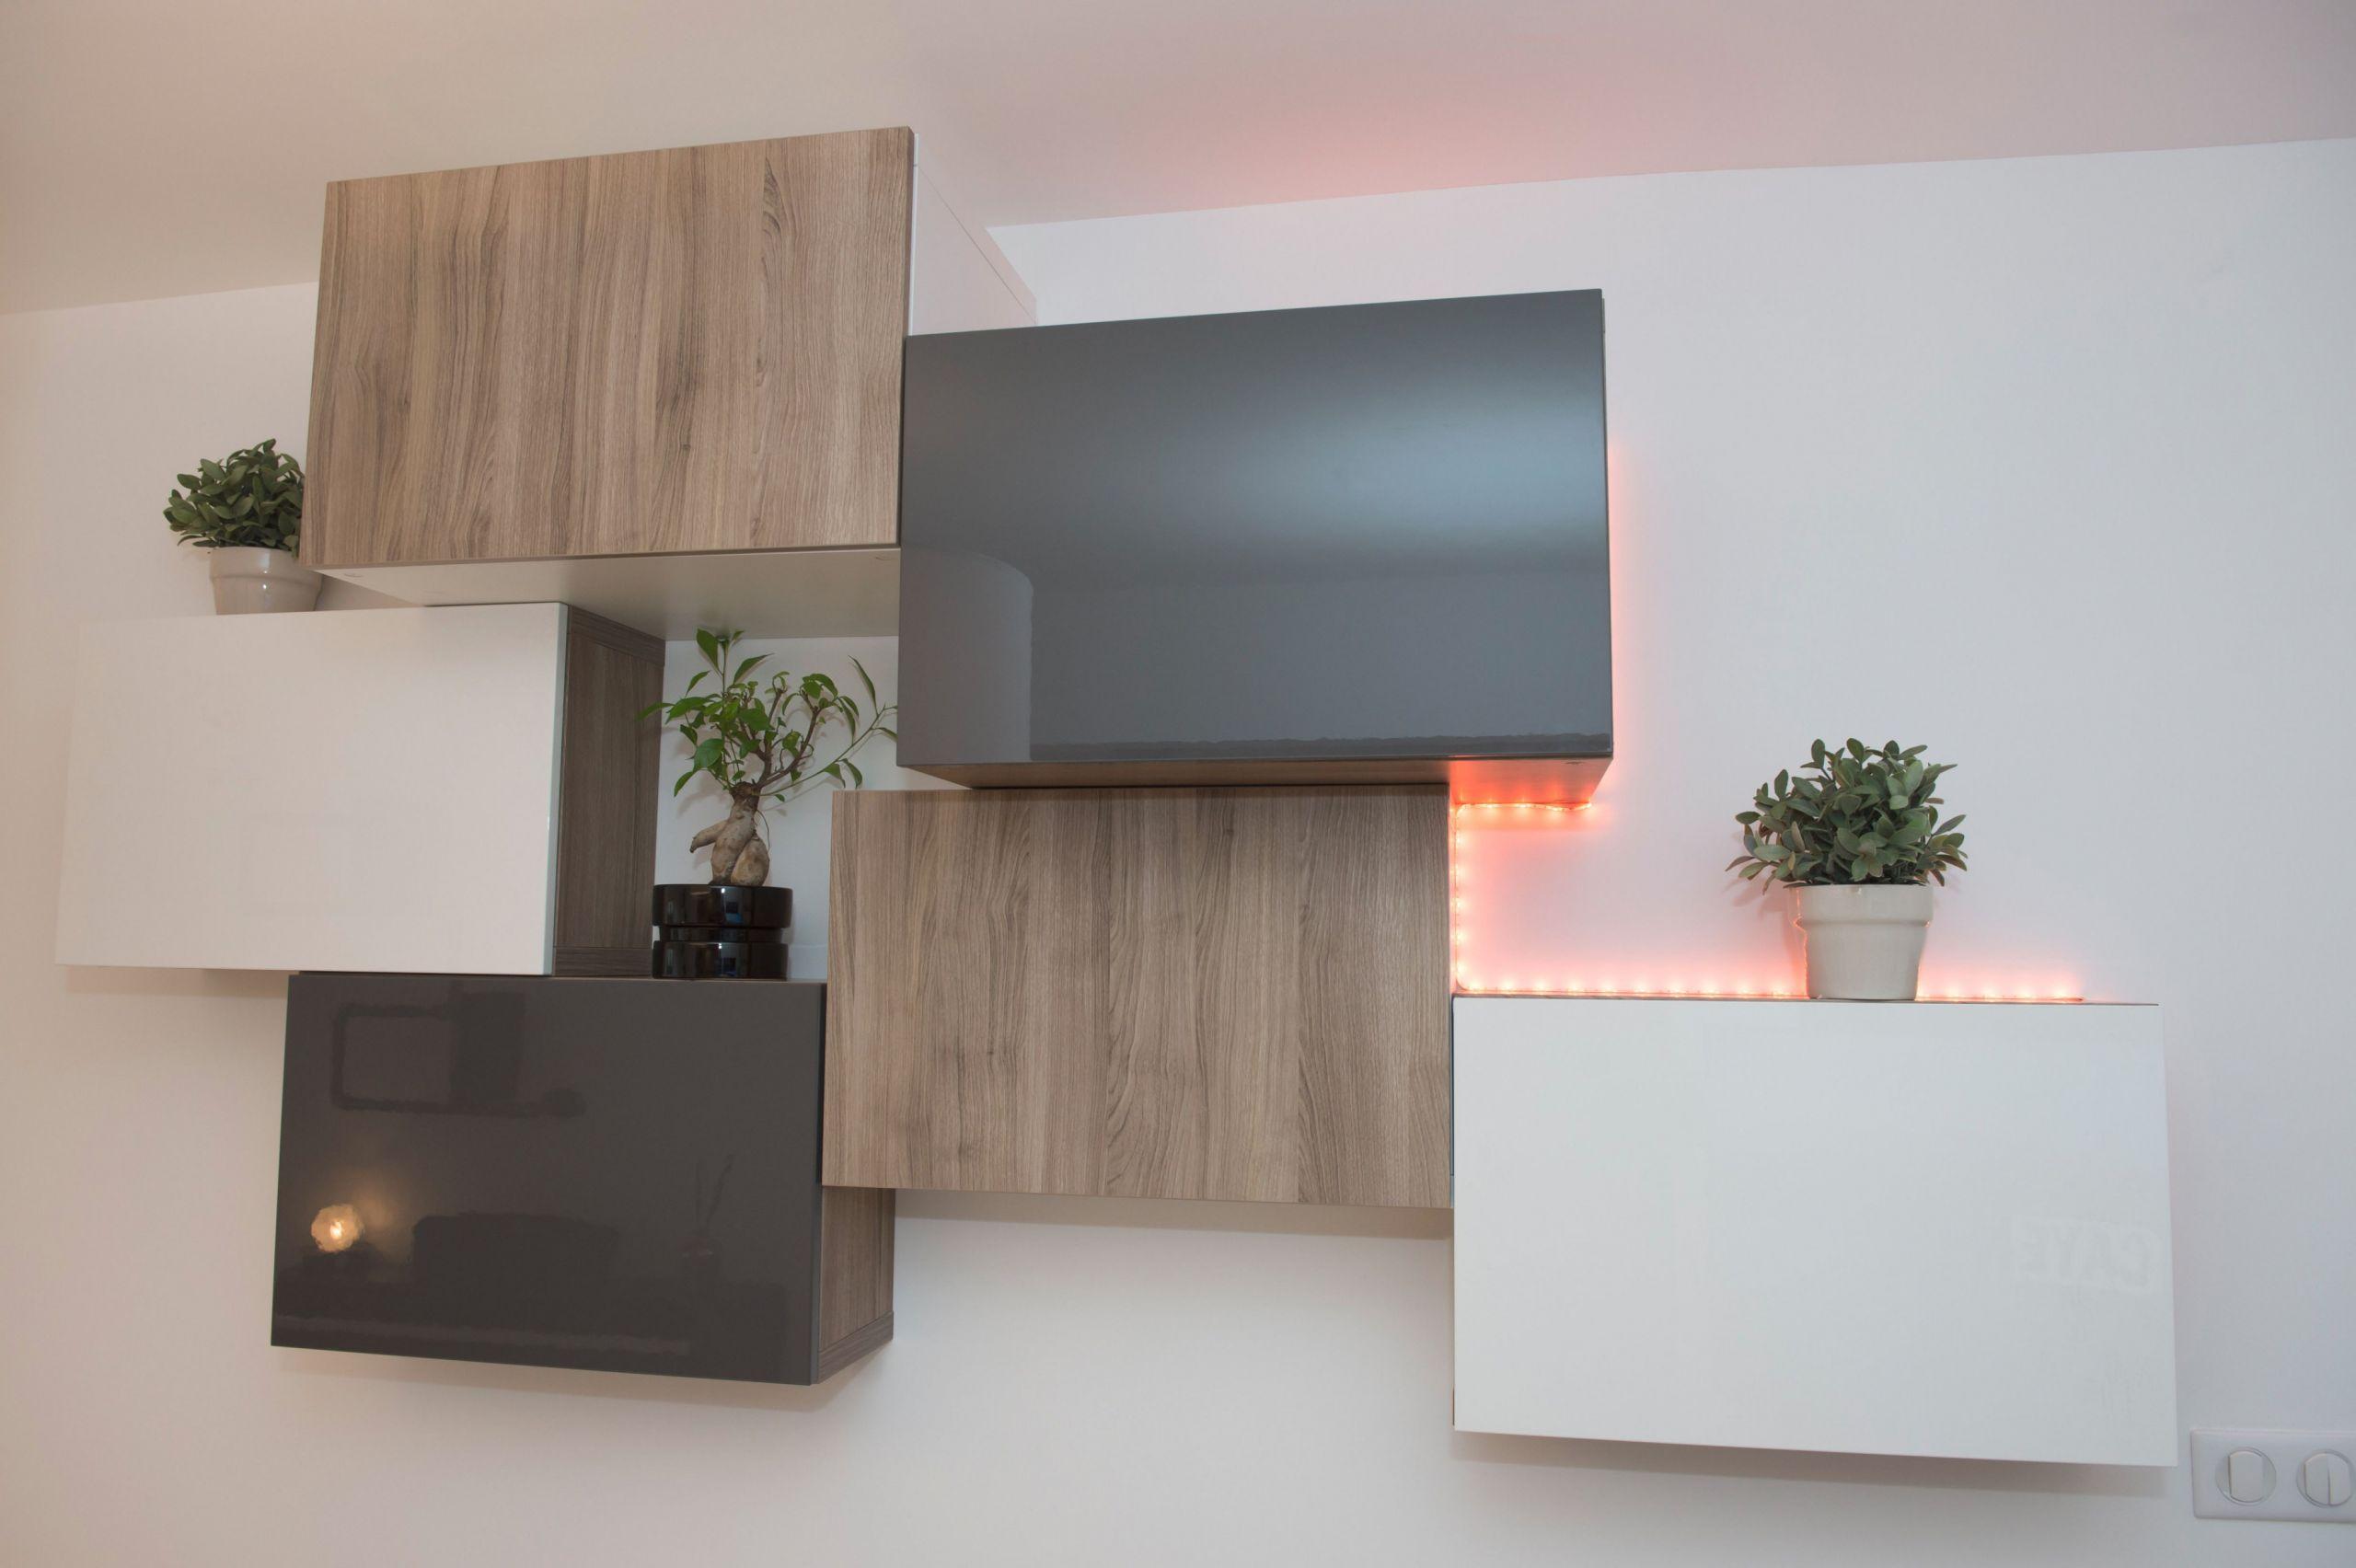 meuble bois design tv console design minimaliste meuble tv bois origins meuble 0d trad of meuble bois design